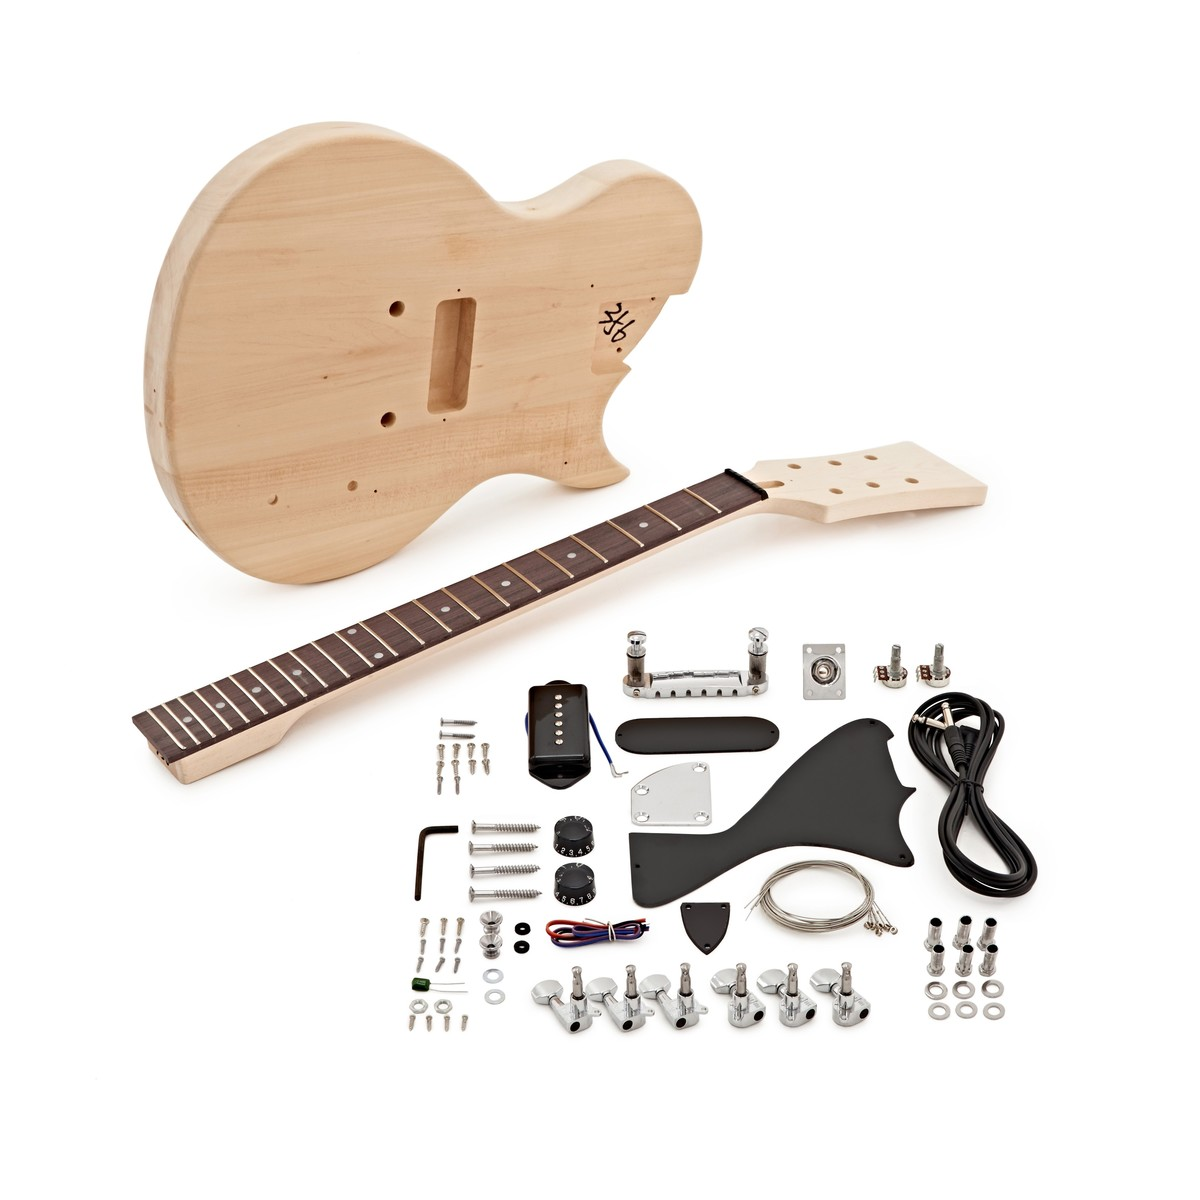 new jersey jr electric guitar diy kit b stock at gear4music. Black Bedroom Furniture Sets. Home Design Ideas